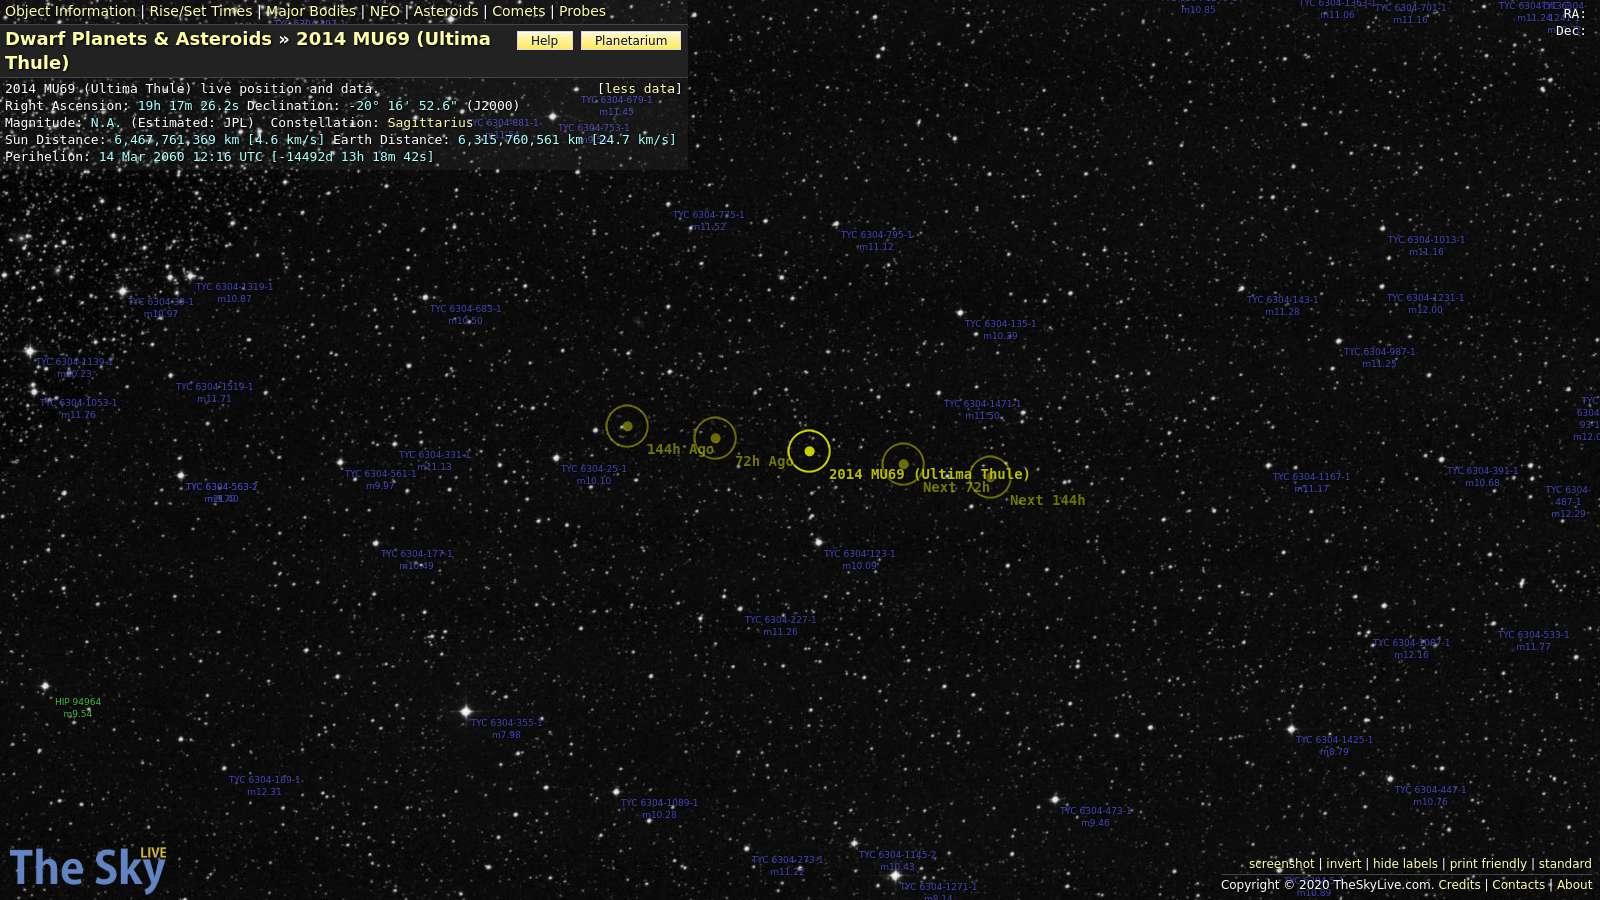 KBO 2014 MU69 Ultima Thule Position And Data Live